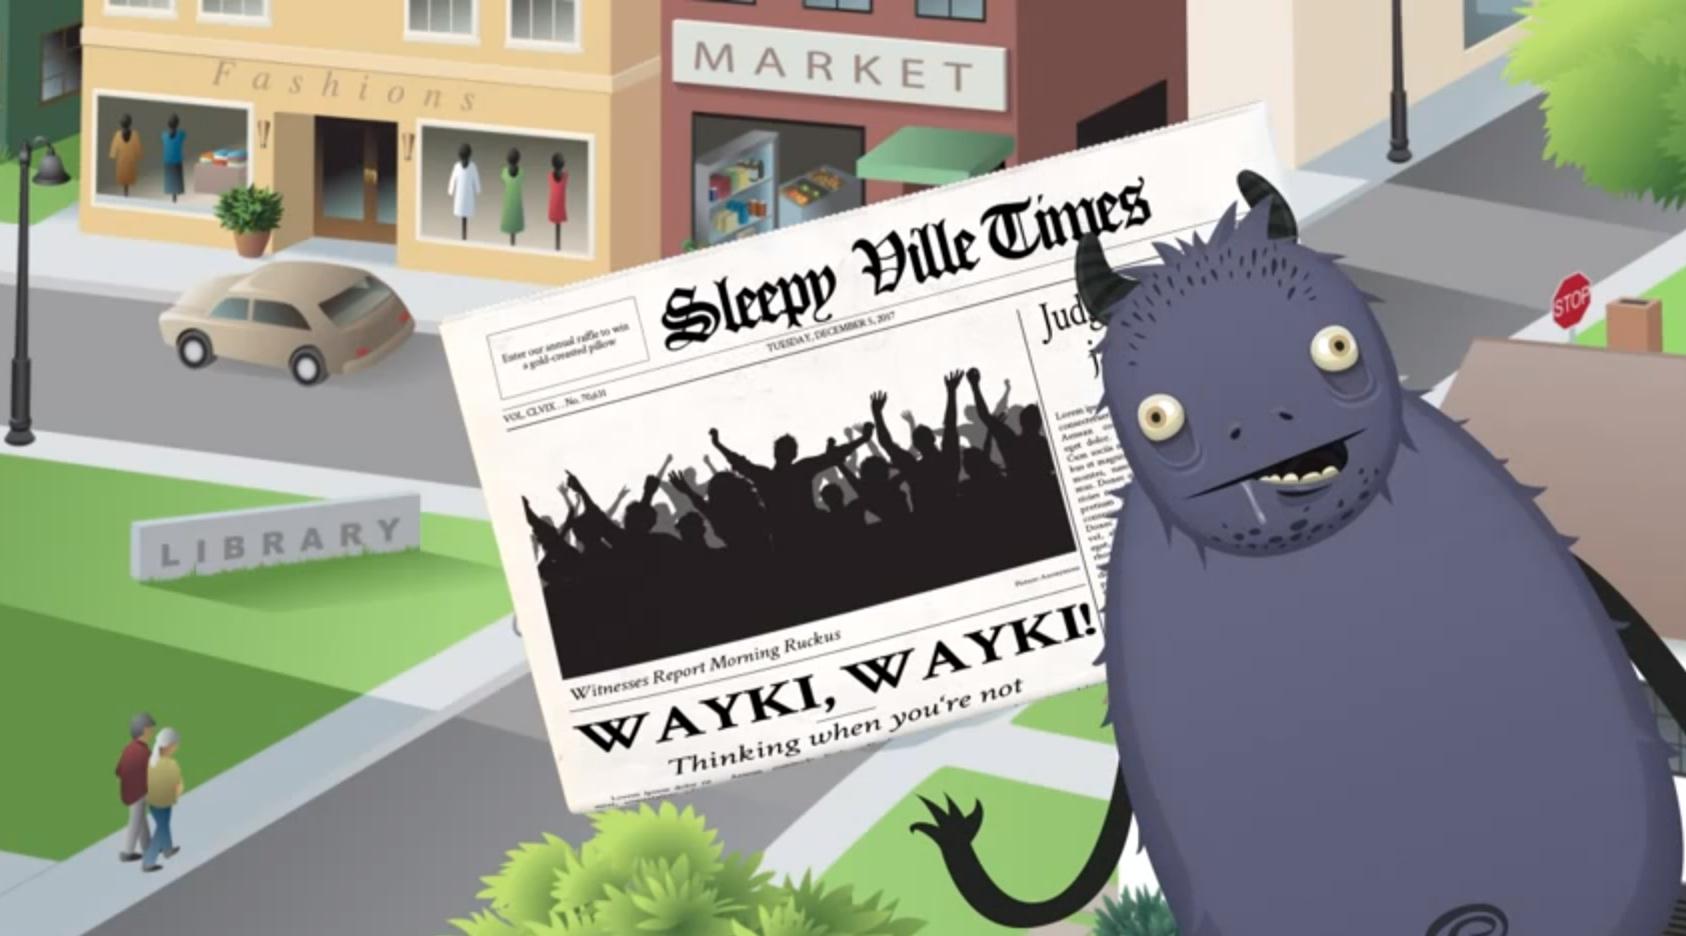 Wayki, Wayki! brush your teeth or you'll become a toothless mounstro!